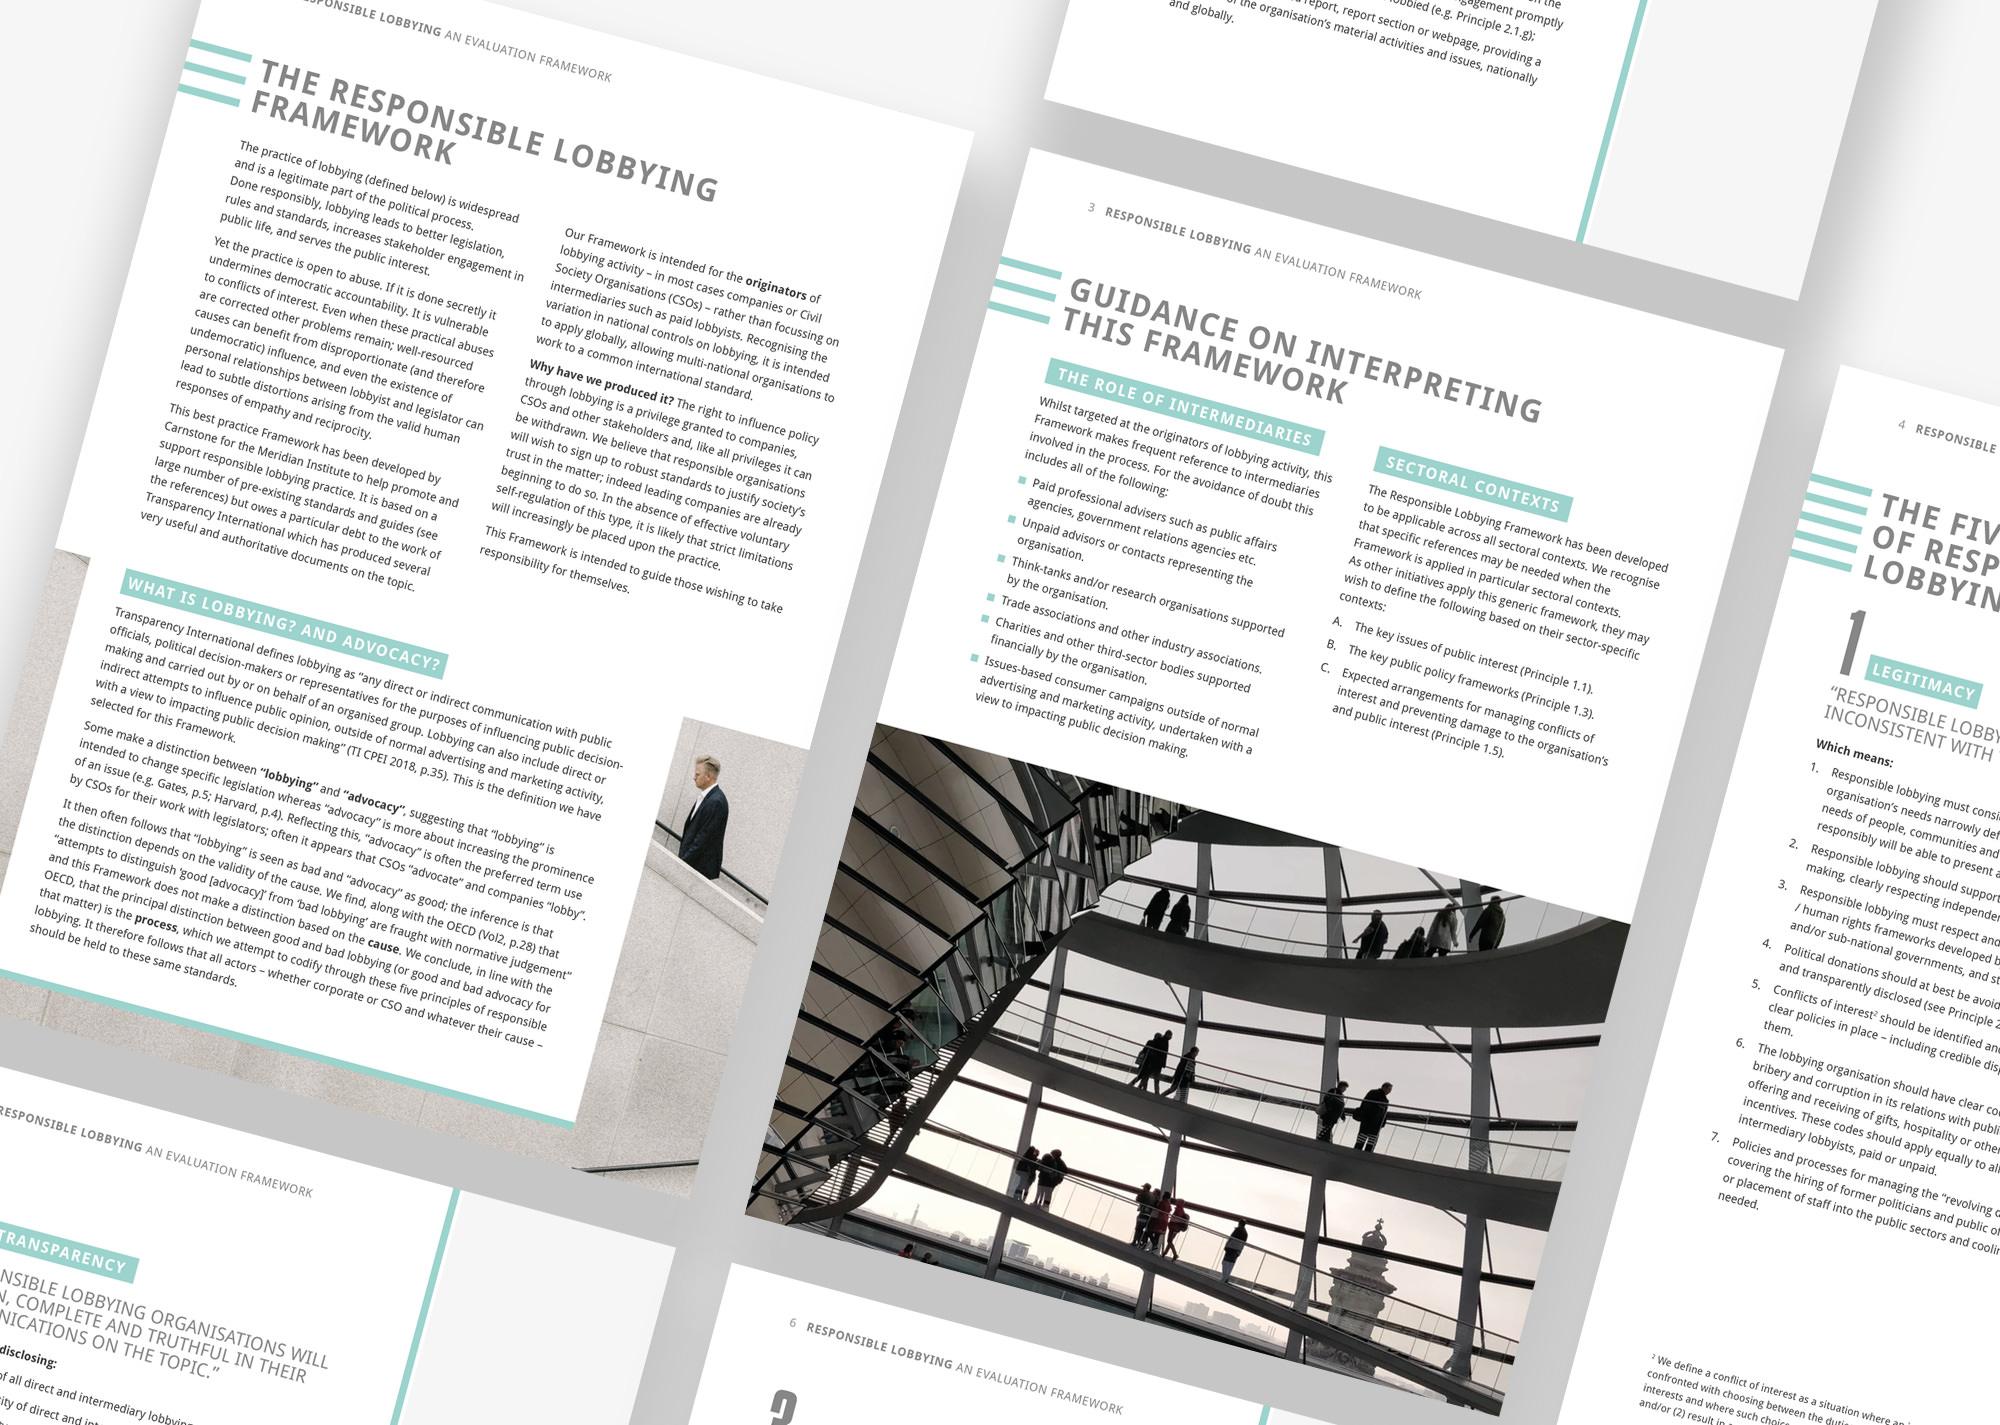 Responsible Lobbying Framework pages